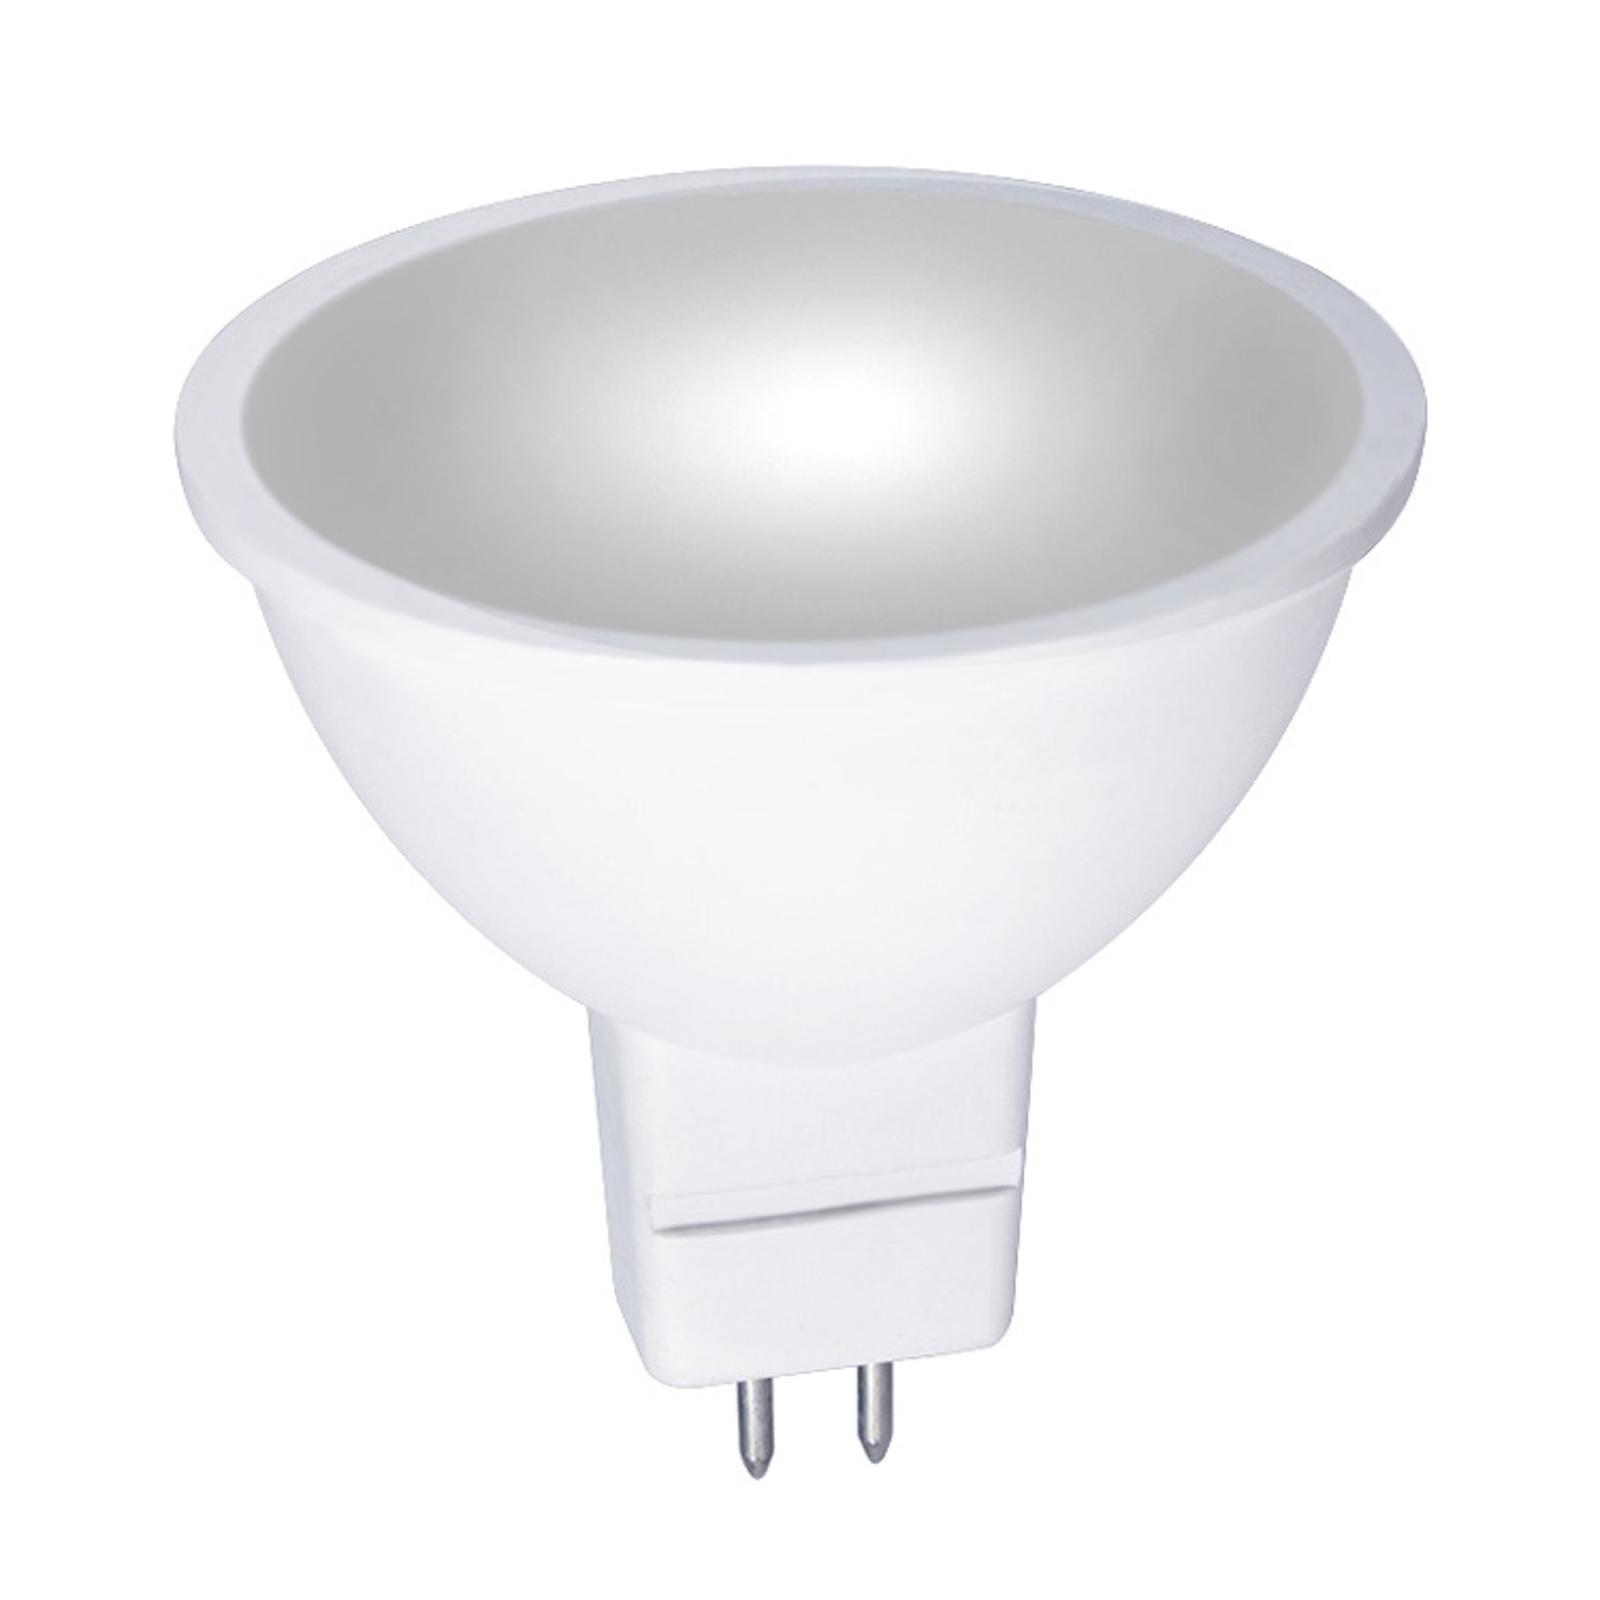 Réflecteur LED KADO GU5,3 7W 3000K